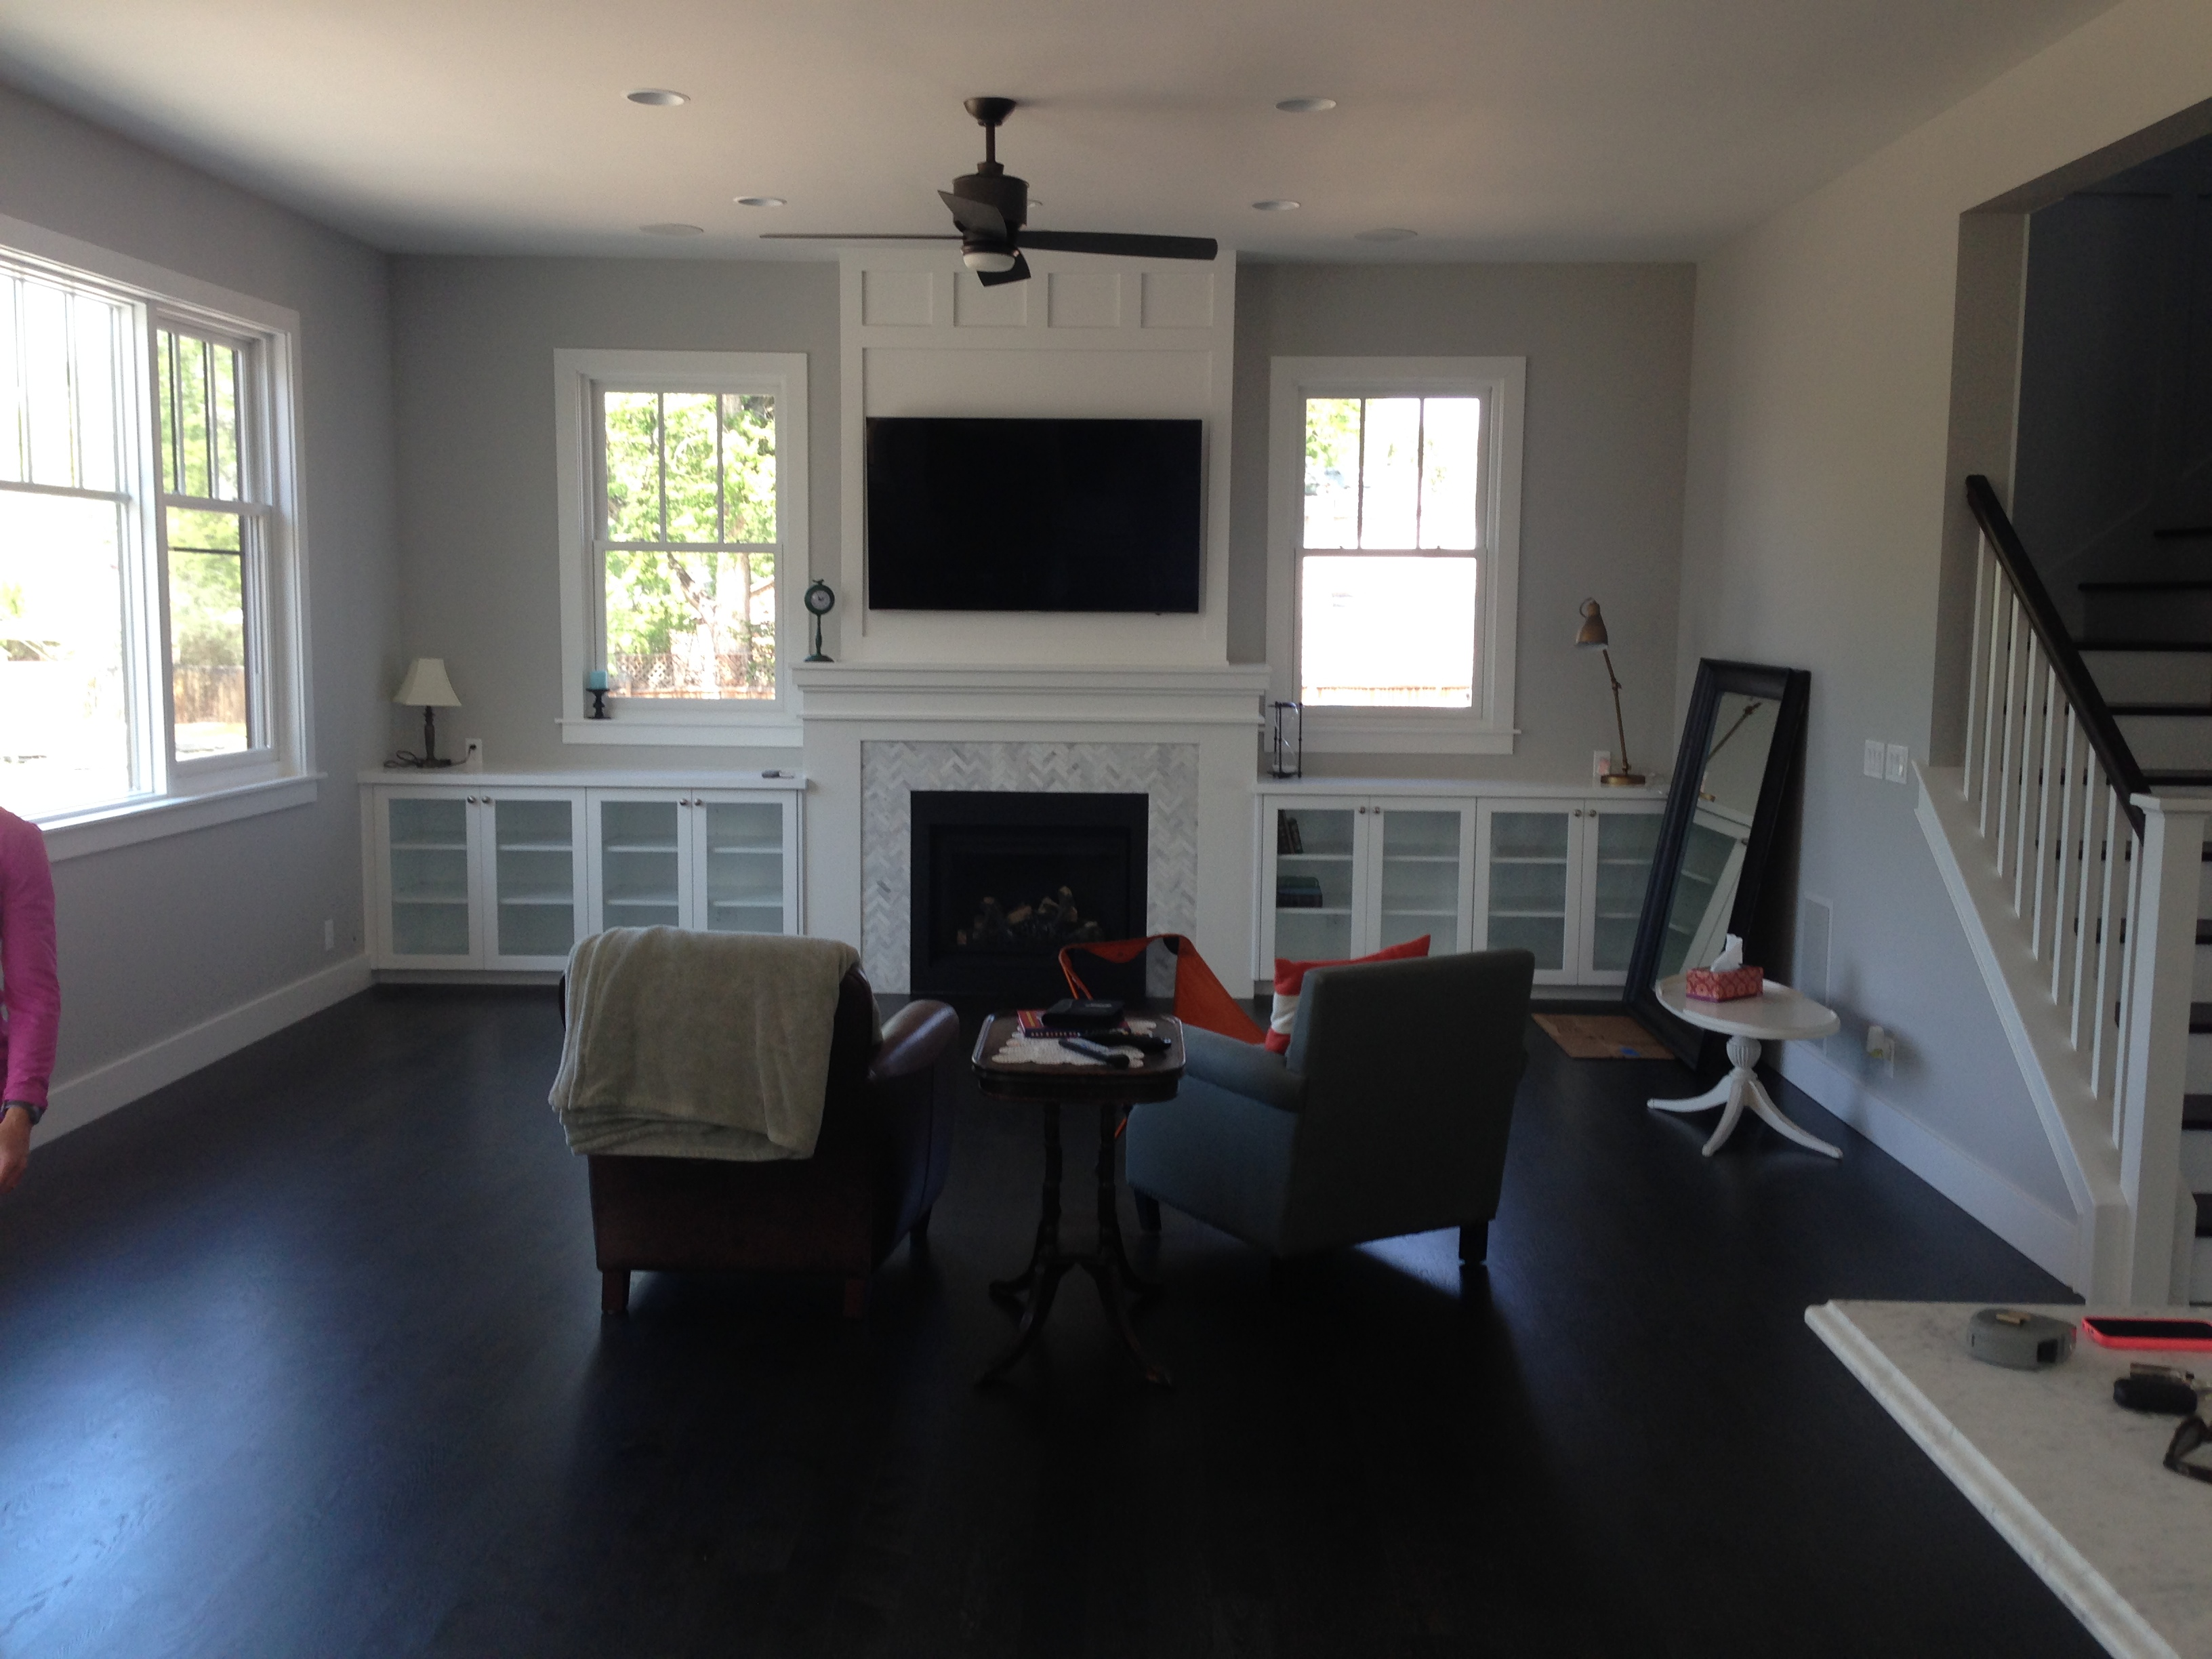 boise new home, Boise new construction, Ogata Construction, craftsman fireplace, dark wood floors